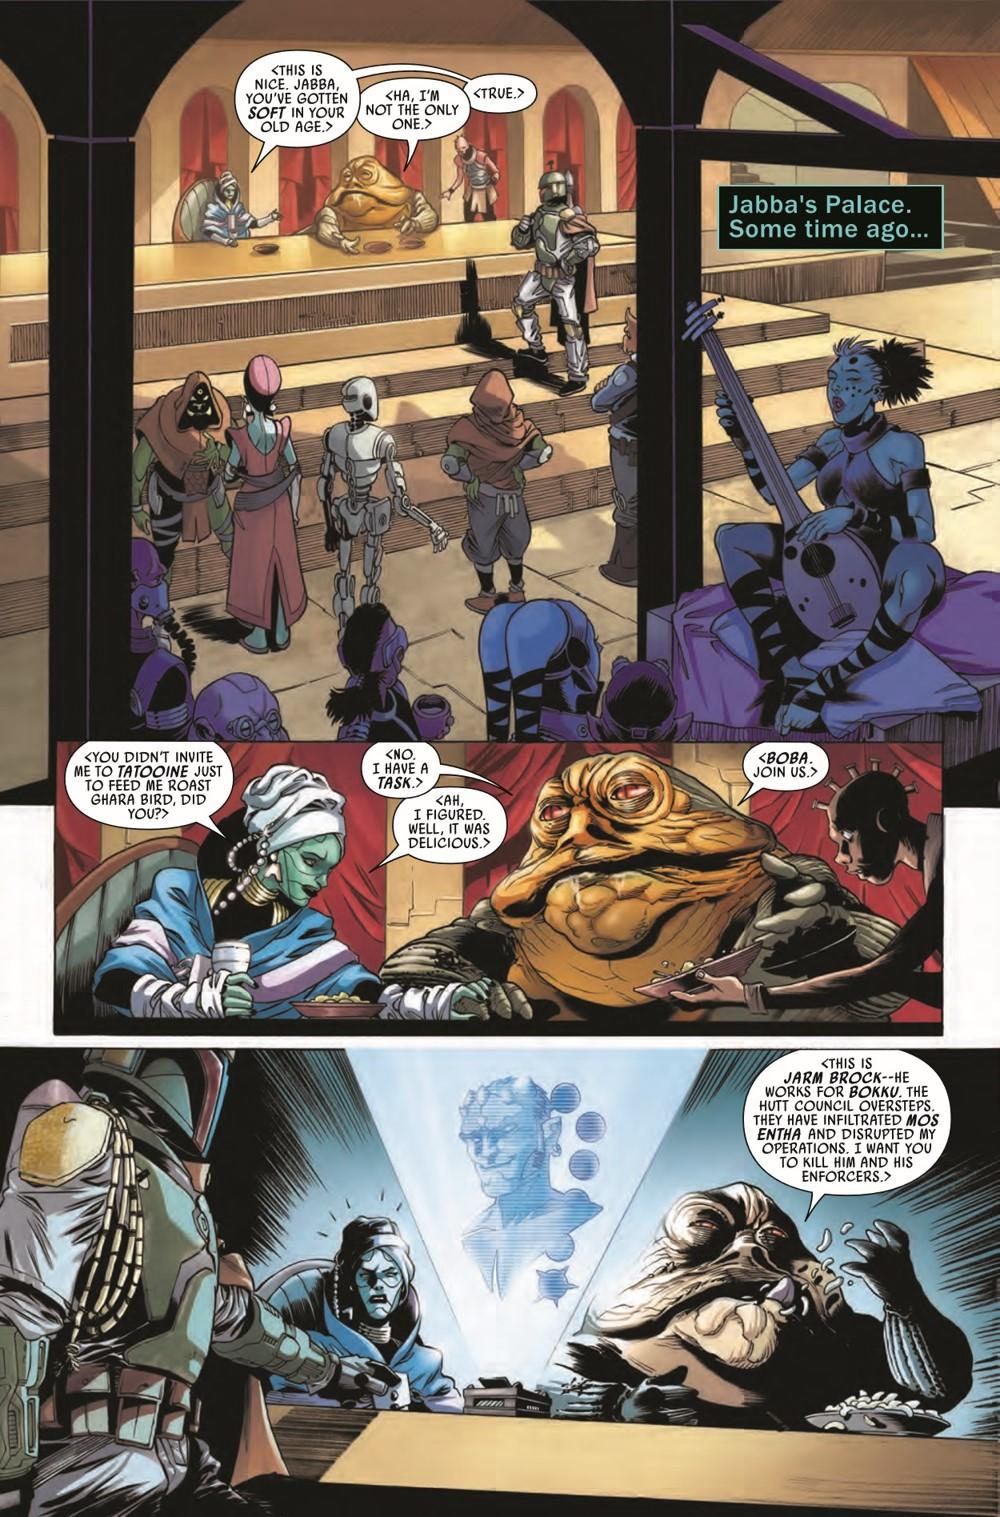 STWWAROTBHJABBAT2021001_Preview-5 ComicList Previews: STAR WARS WAR OF THE BOUNTY HUNTERS JABBA THE HUTT #1